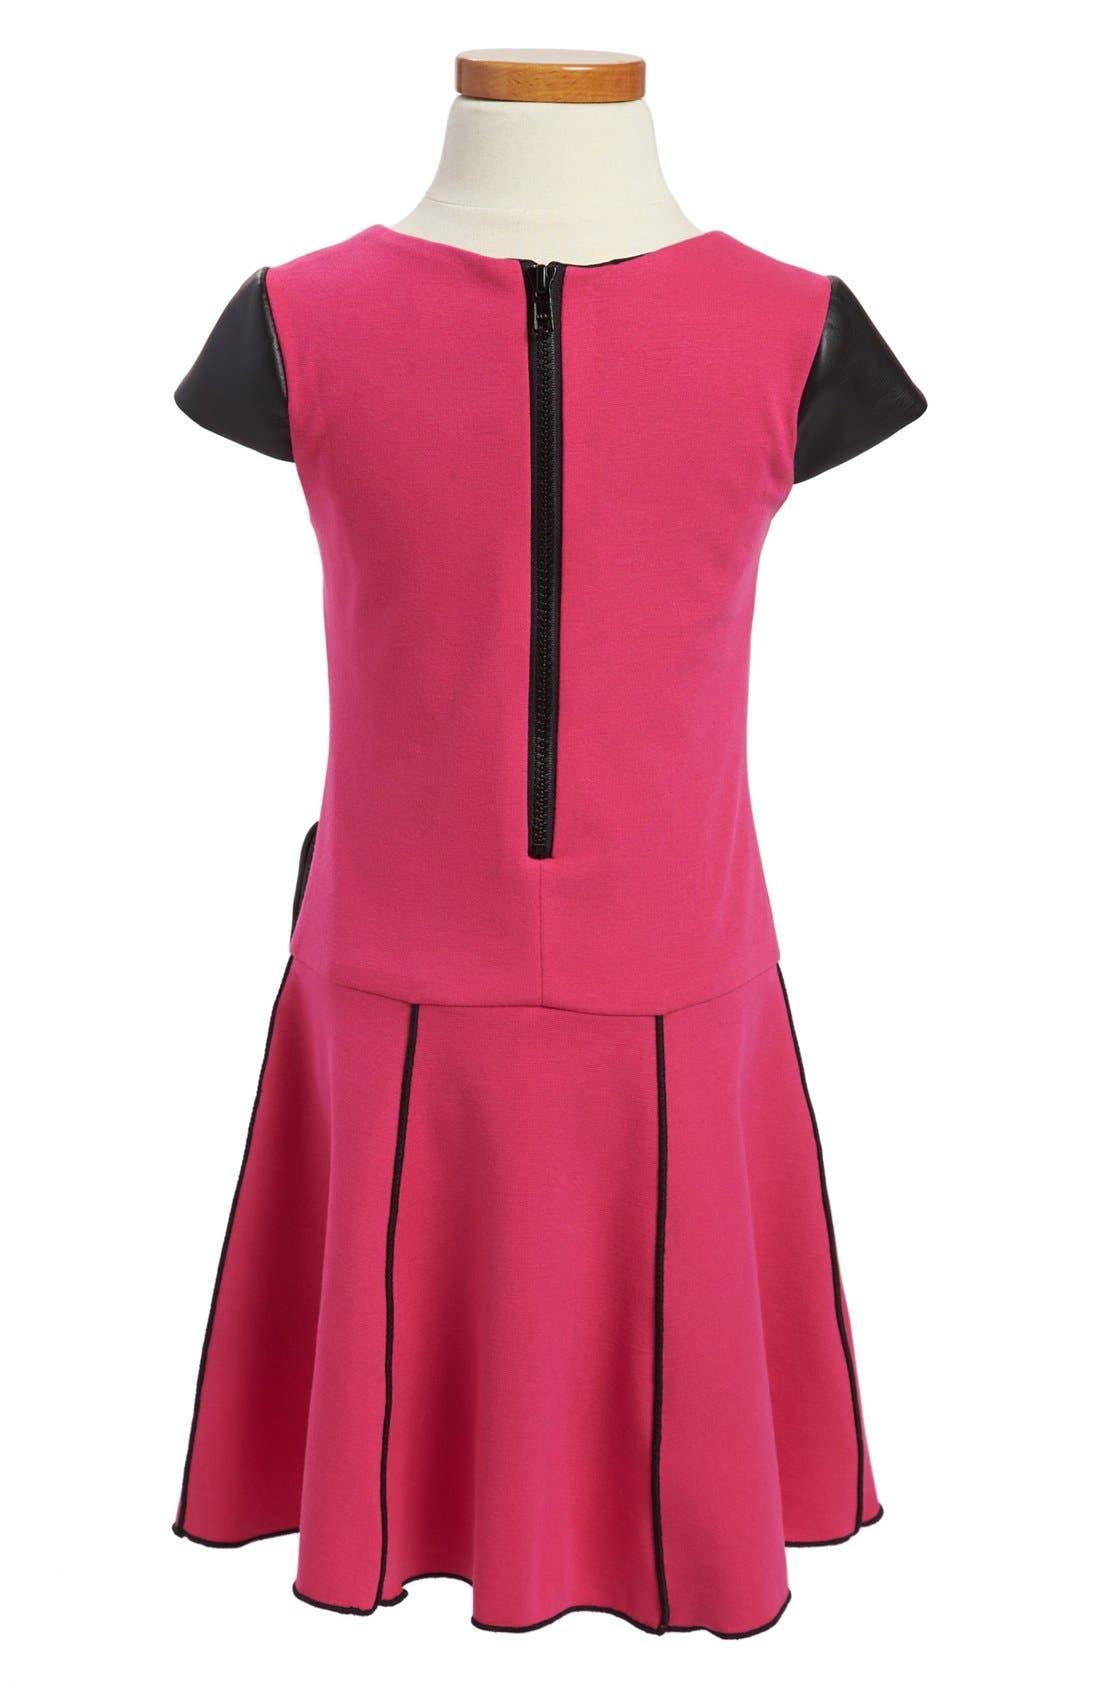 Alternate Image 2  - Zoe Ltd Faux Leather Trim Dress (Little Girls & Big Girls)